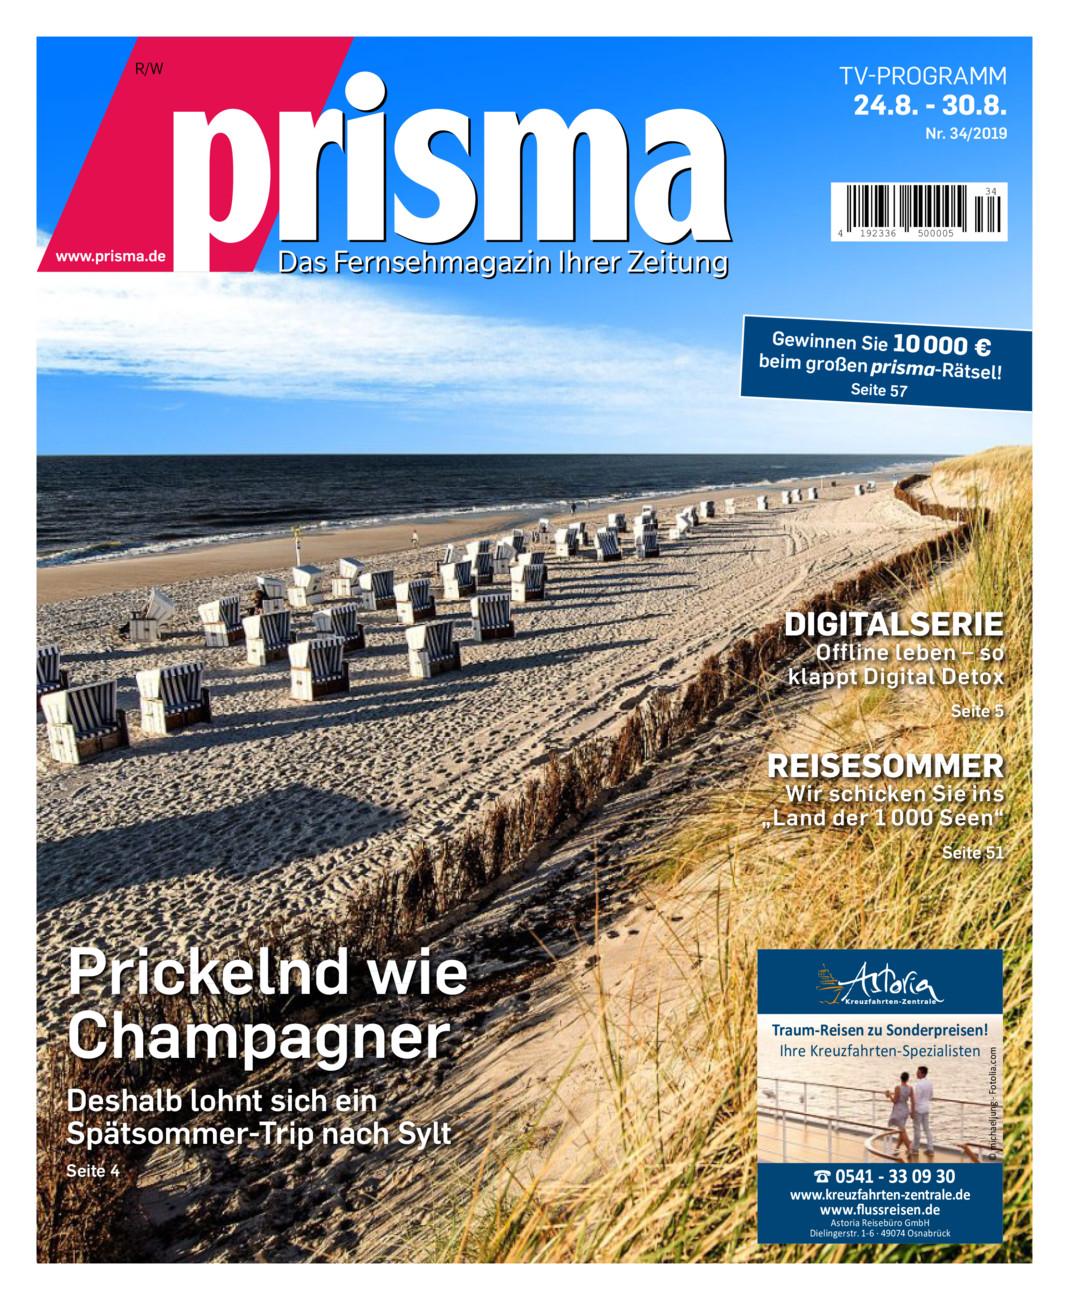 Prisma 24.8. - 30.8.